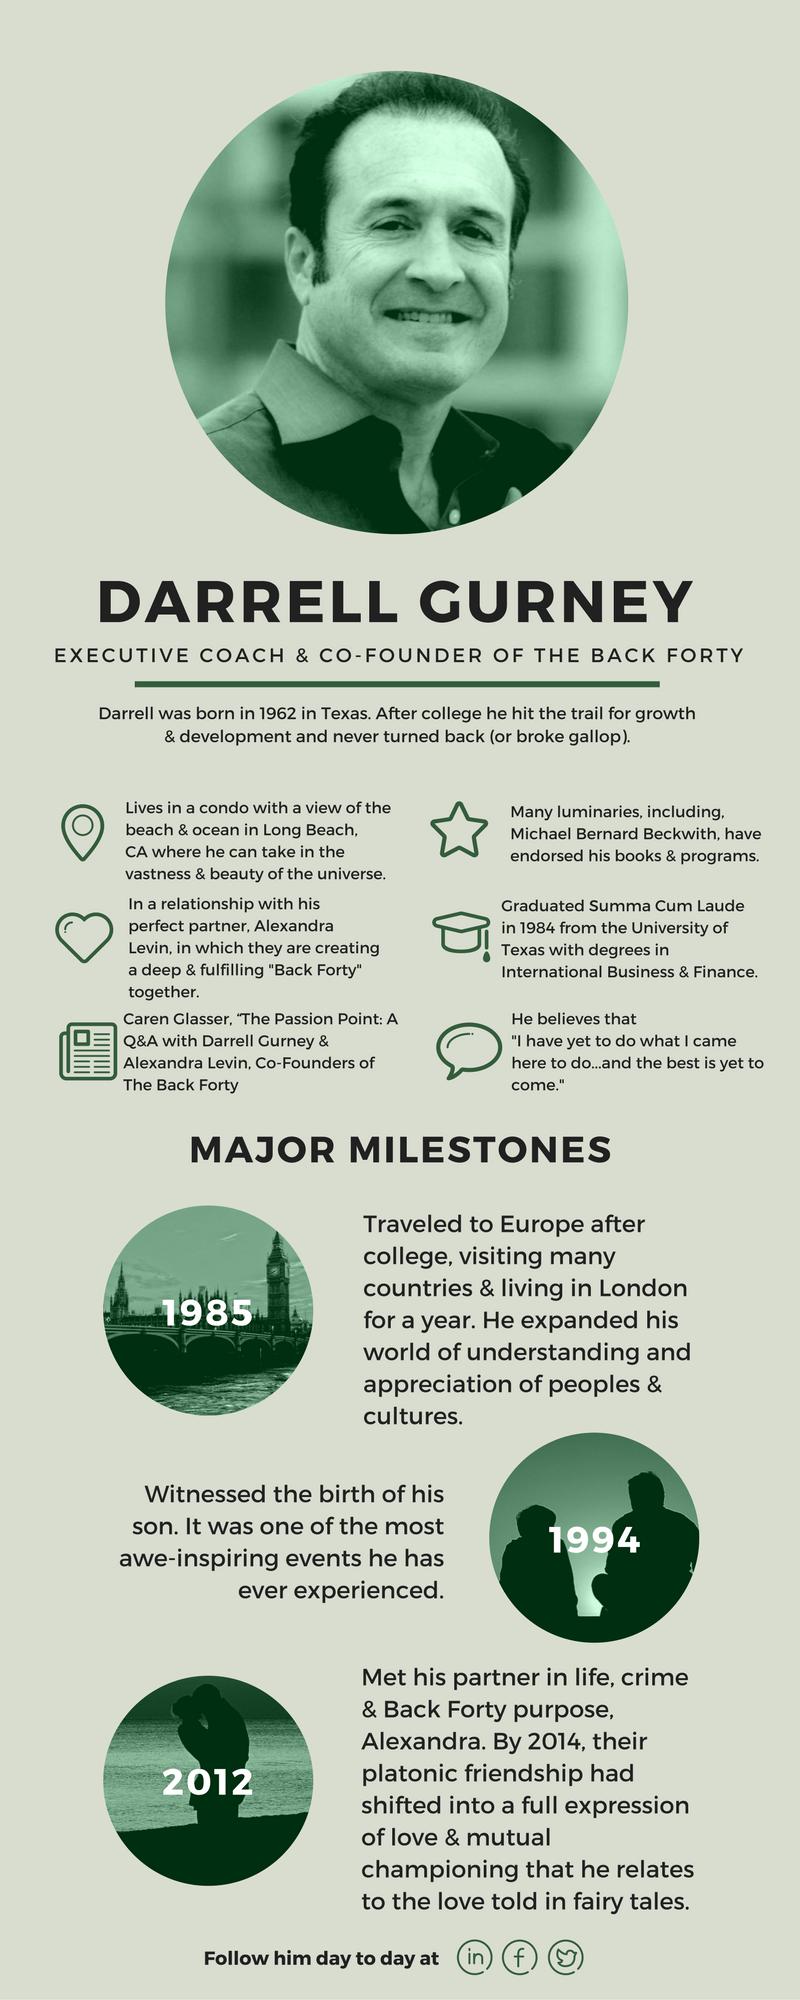 darrell-gurney-infographic